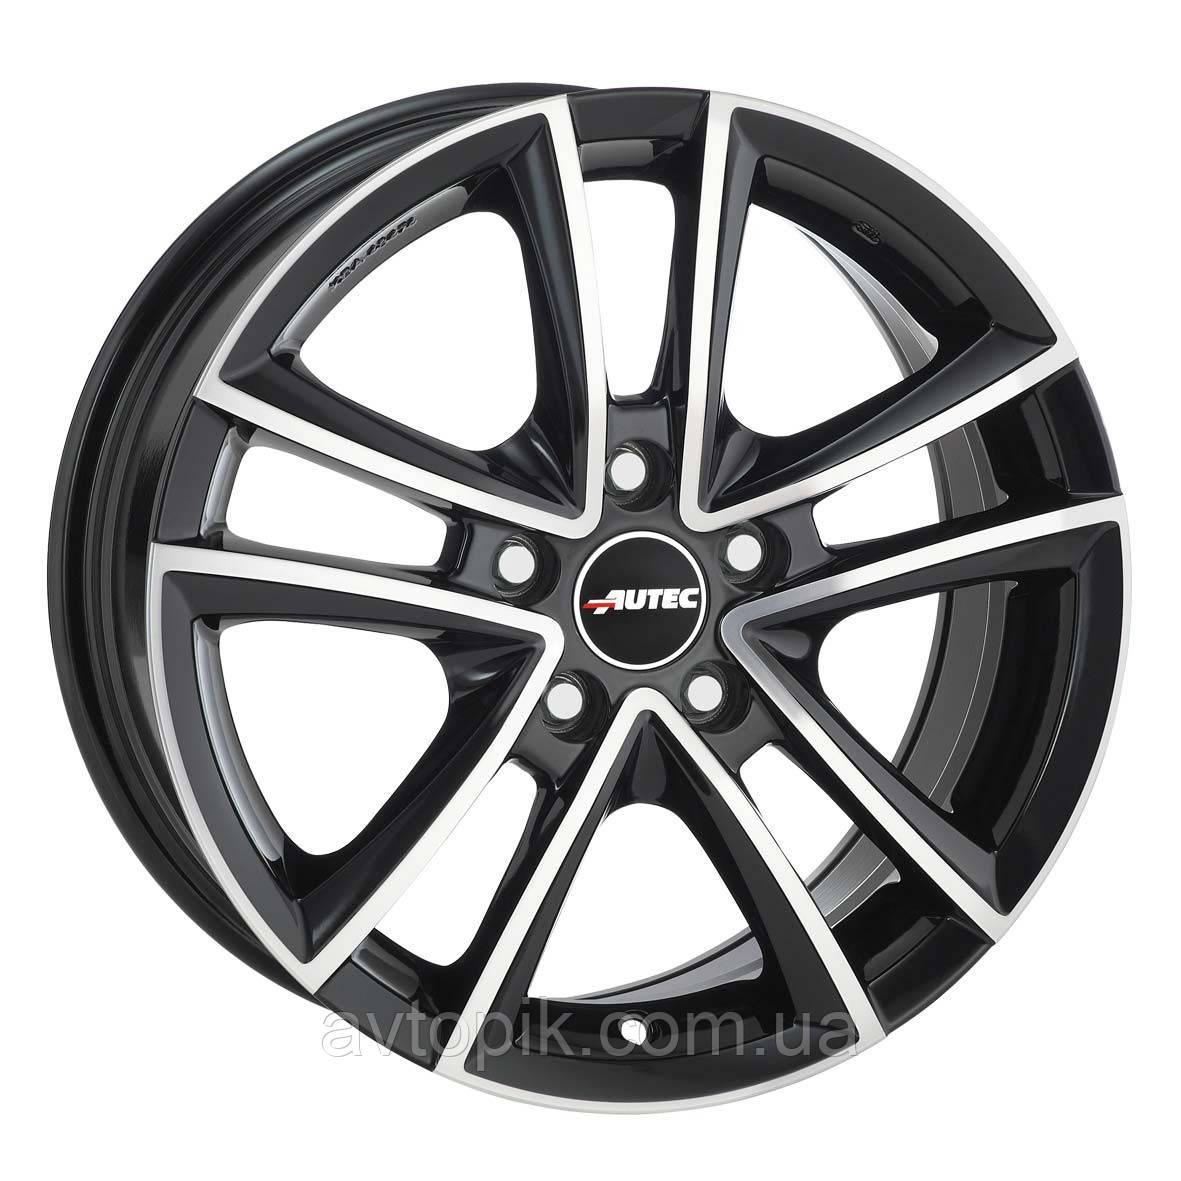 Литые диски Autec Yukon R15 W6.5 PCD5x100 ET43 DIA57.1 (black polished)